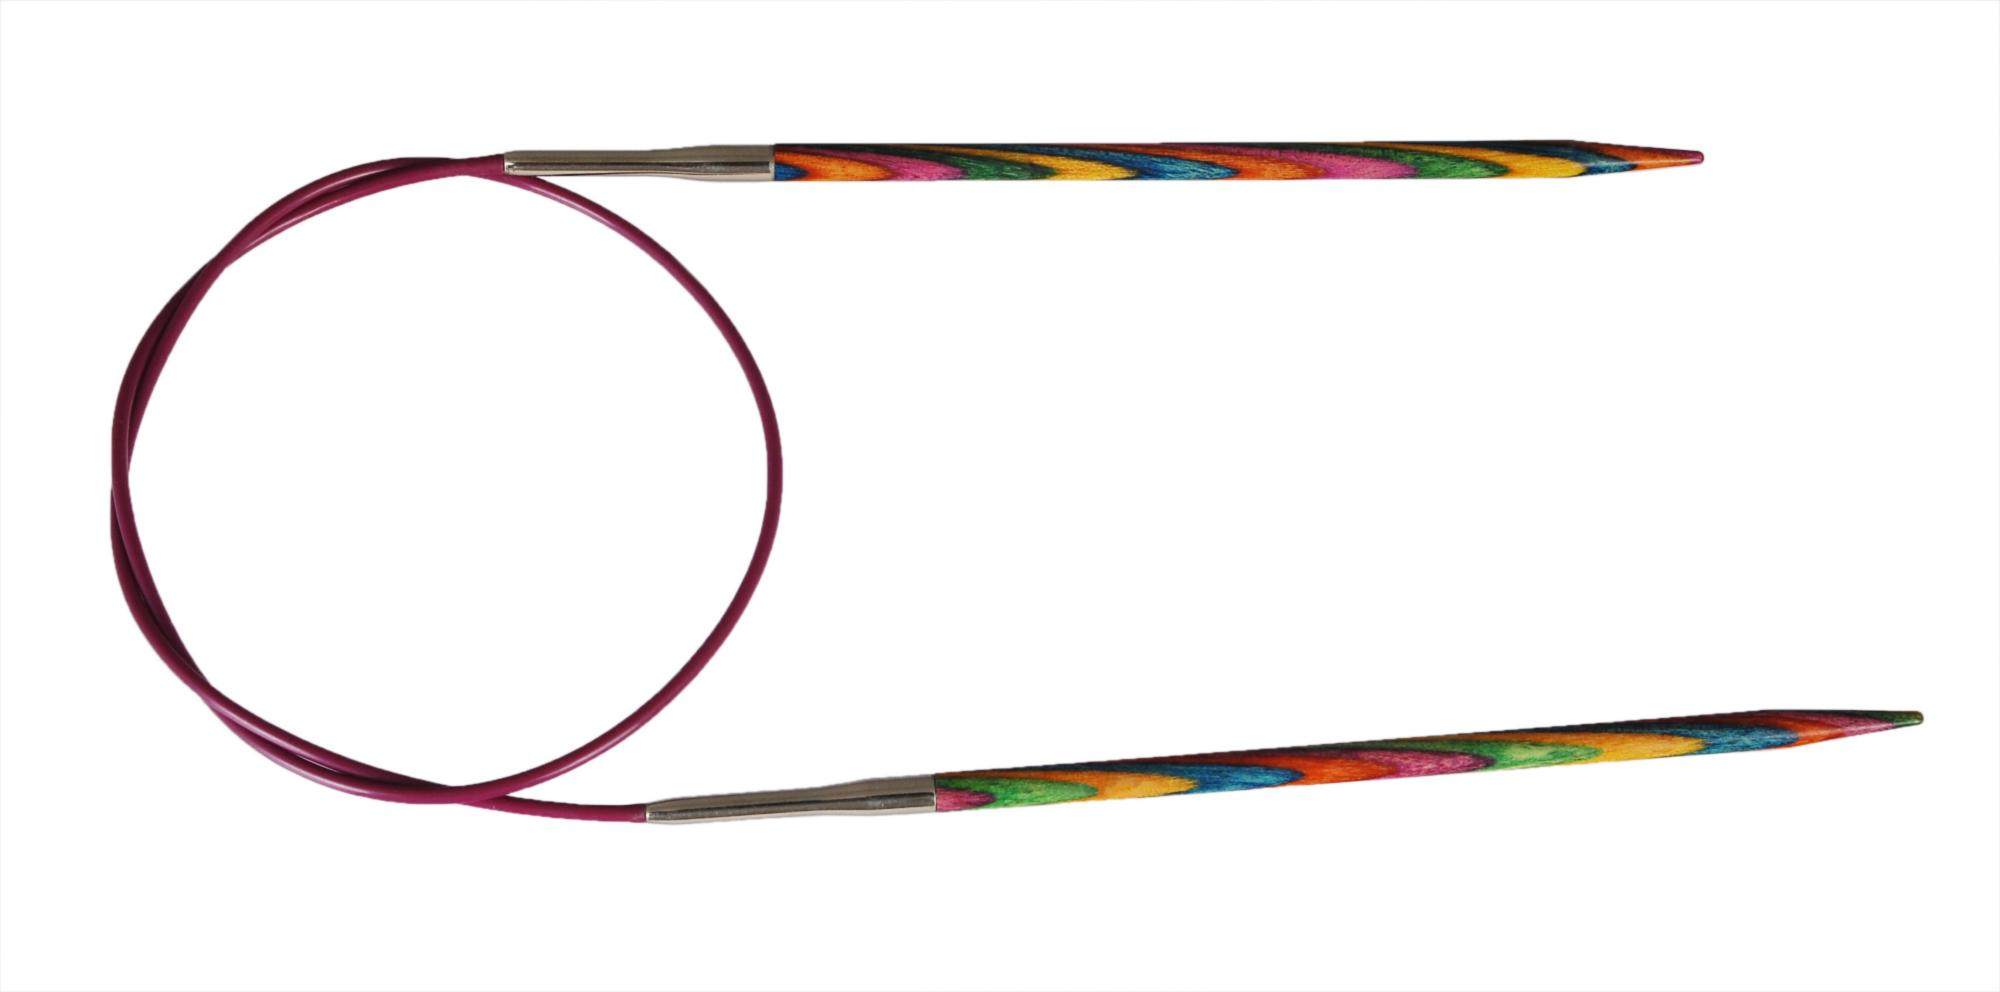 Спицы круговые 150 см Symfonie Wood KnitPro, 21389, 8.00 мм